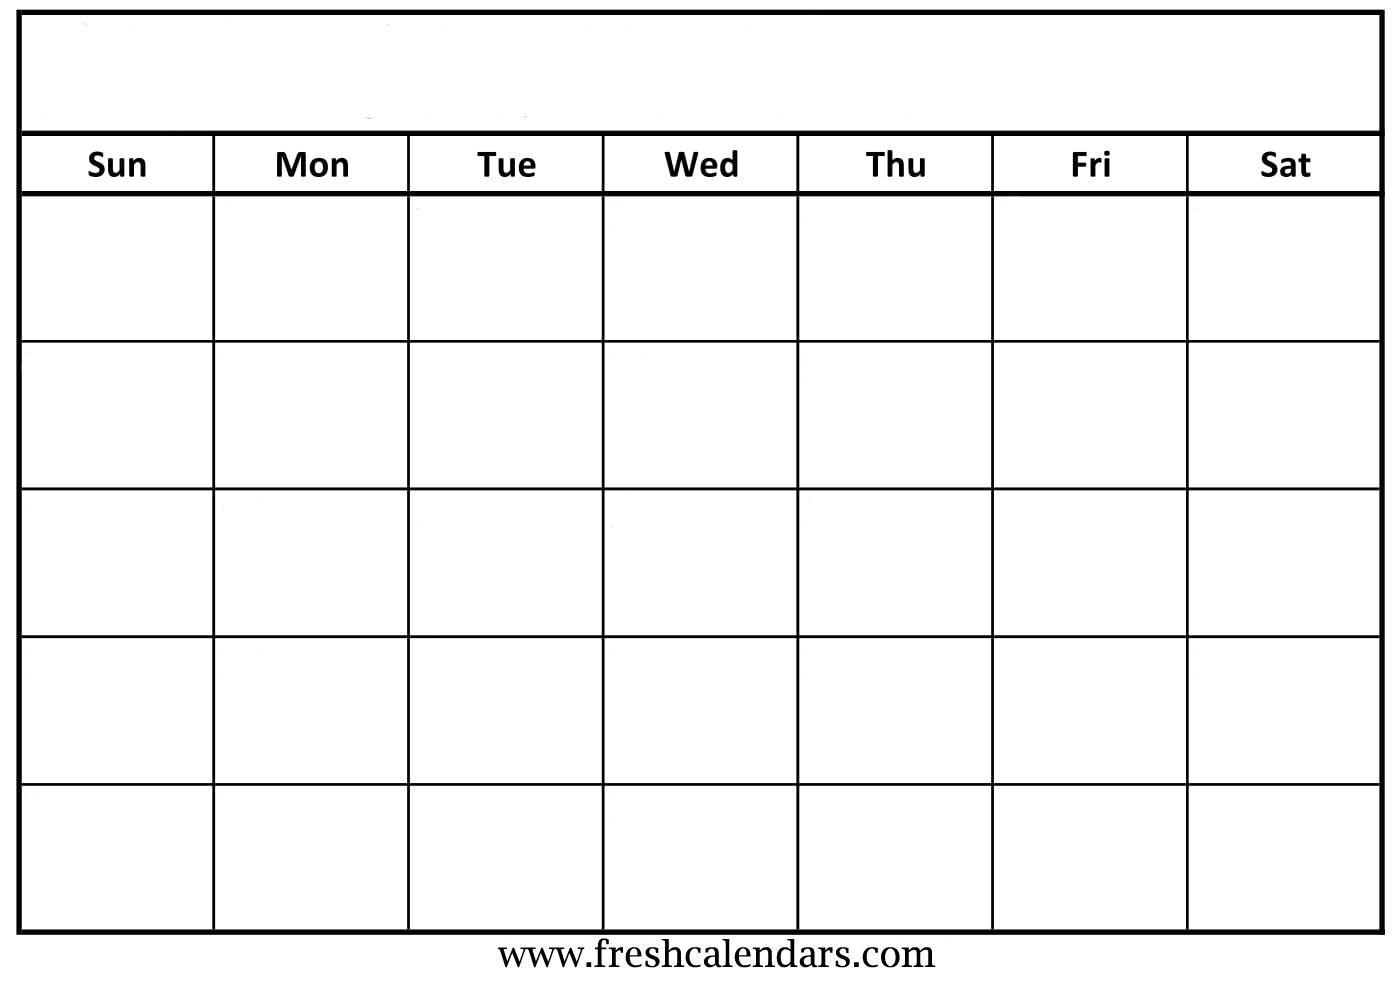 Blank Calendar: Wonderfully Printable 2019 Templates intended for Printable Blank Calendar Template